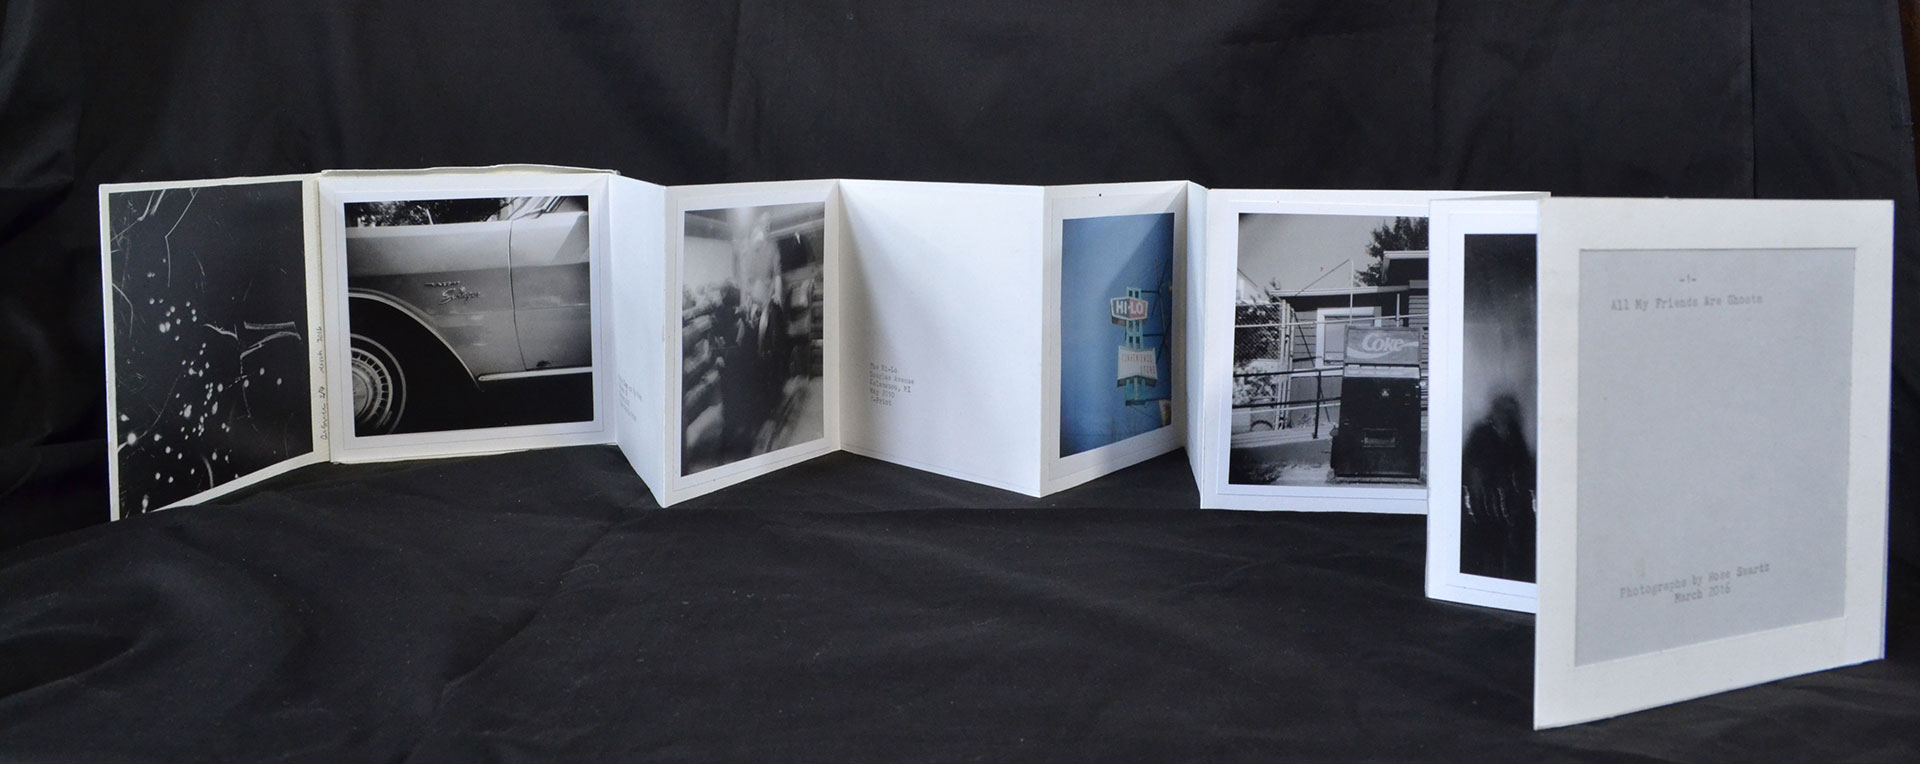 Rose Swartz, All My Friends Are Ghosts, Silver Gelatin Prints, C-prints, paper, vellum, 2016